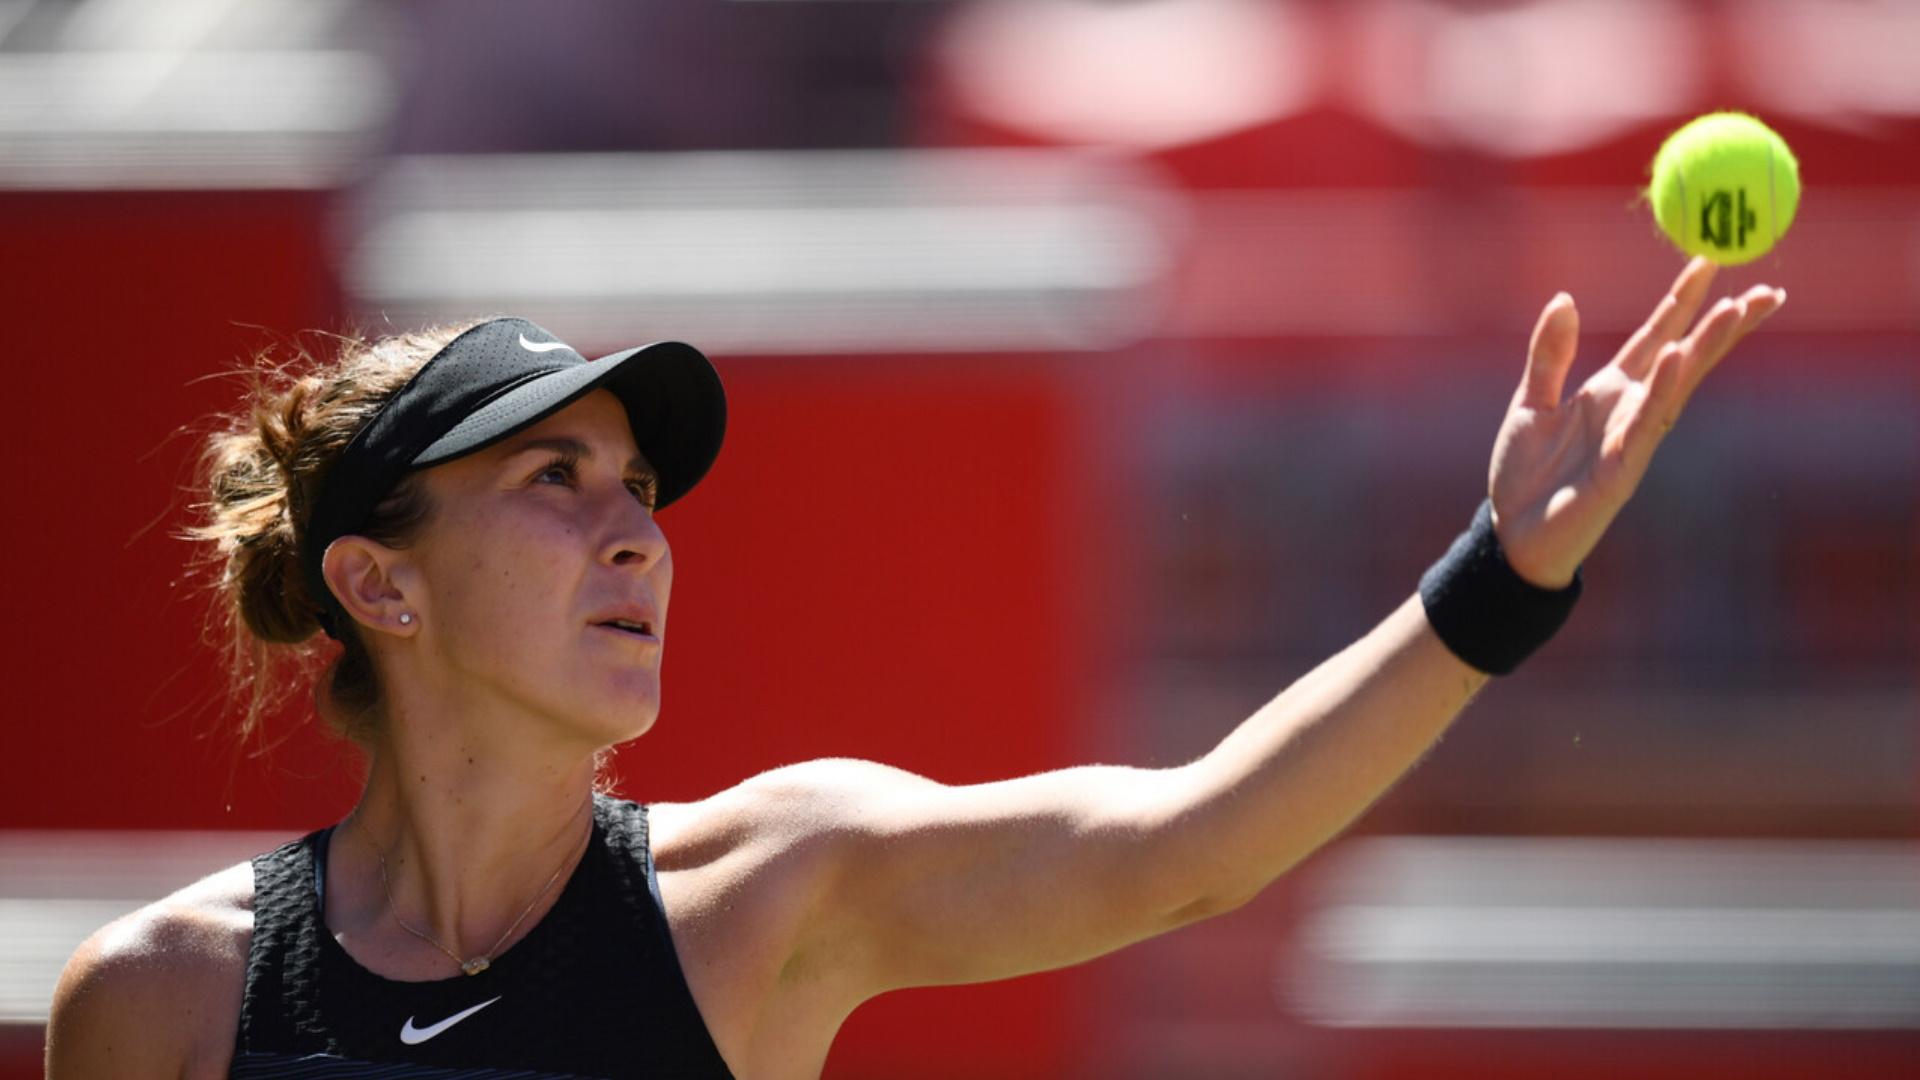 WTA Torneo Berlín: Belinda Bencic - Petra Martic